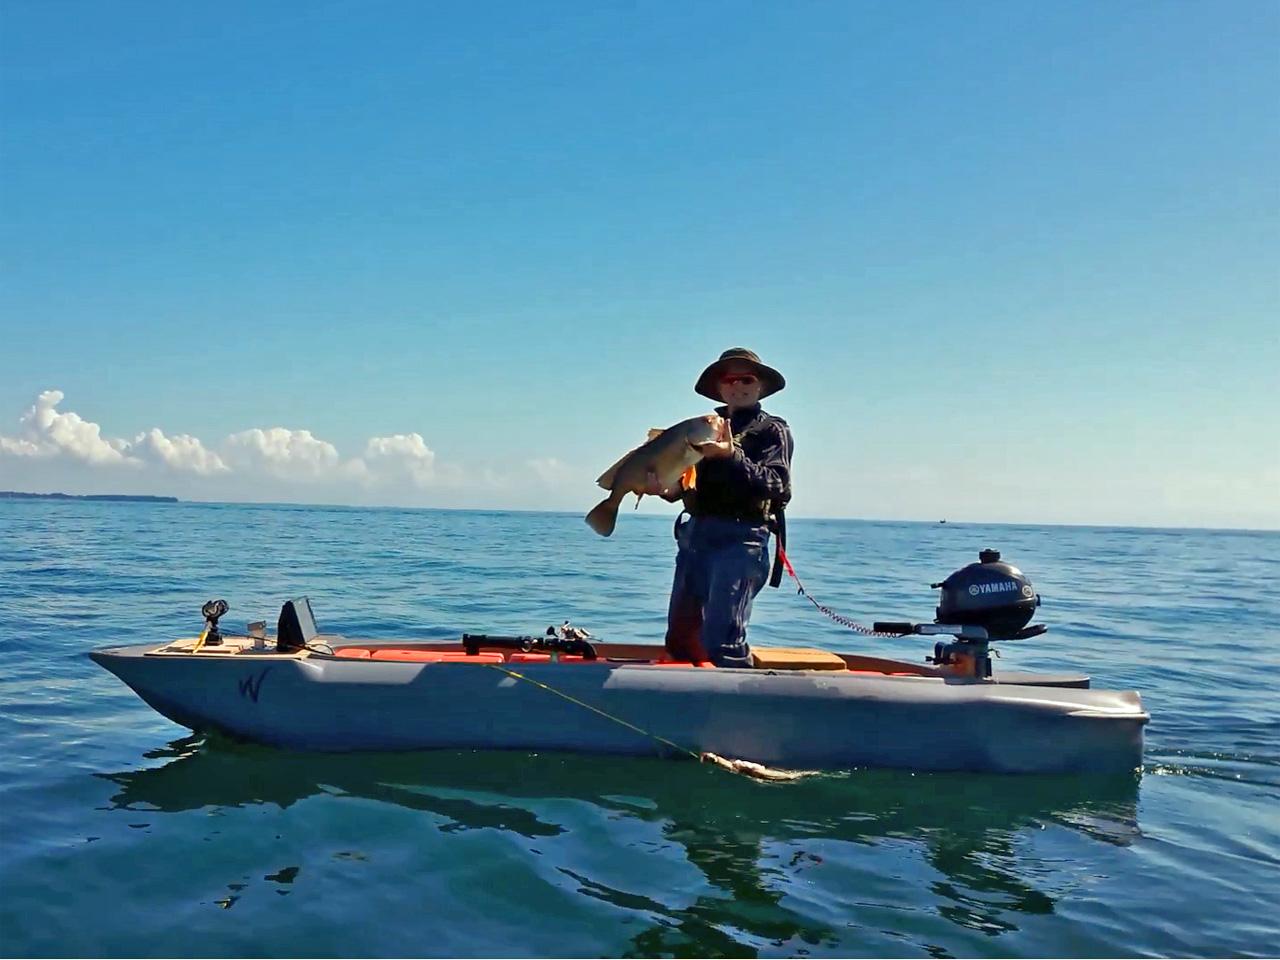 Fishing from a Wavewalk S4 motor kayak boat